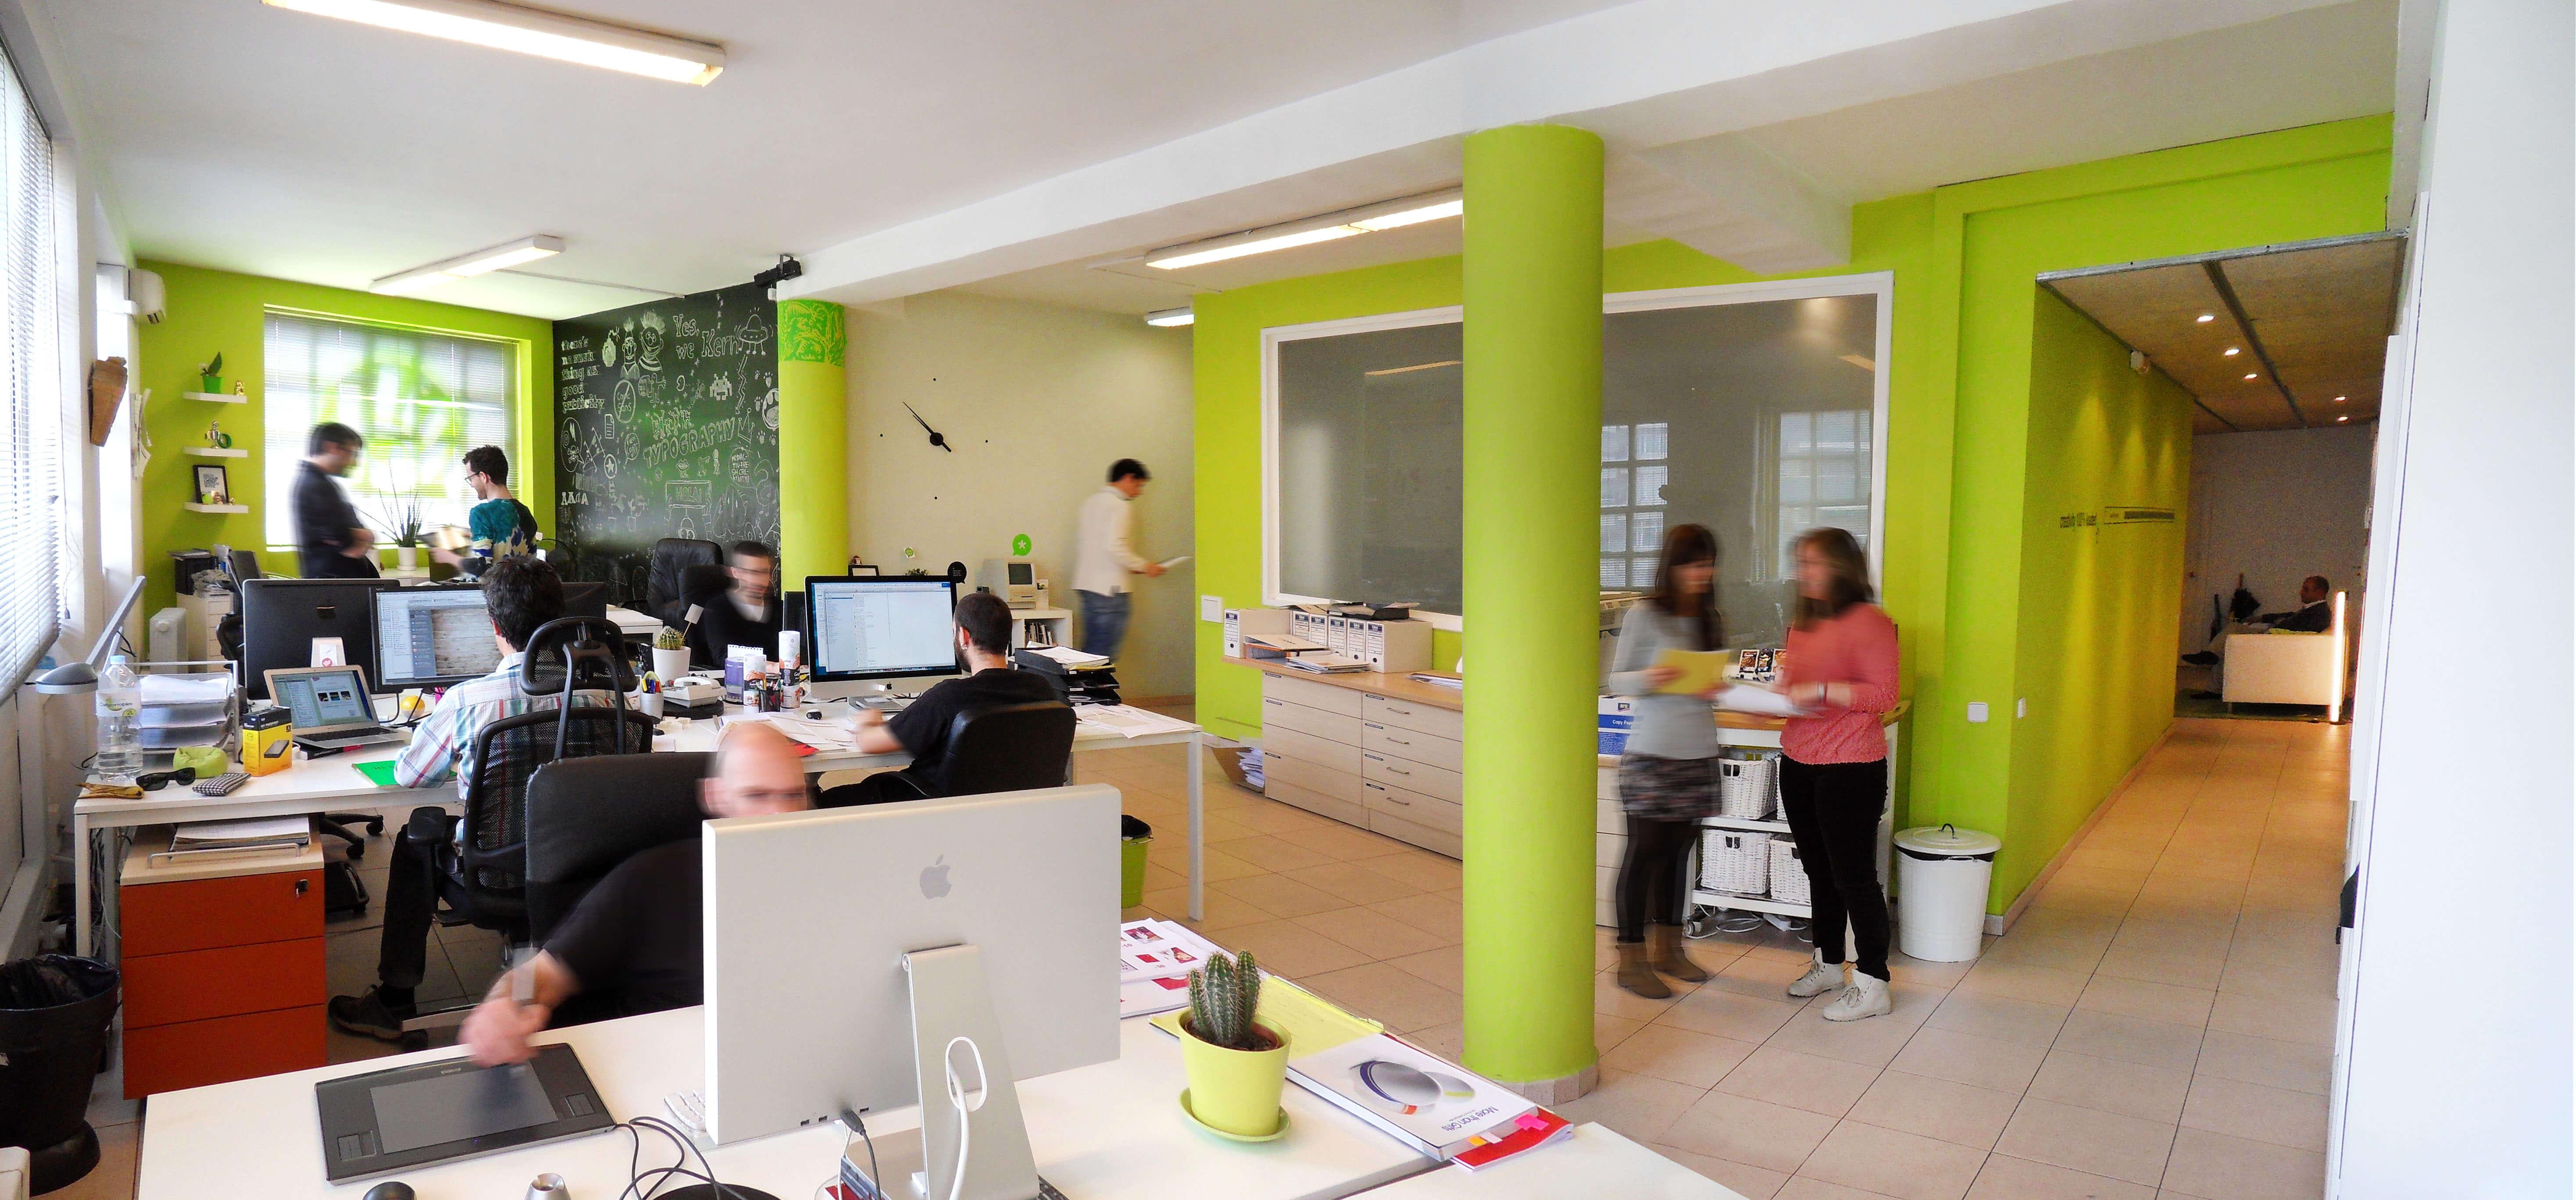 Mediactiu estudi disseny grafic - Entrevista de Aiject a Mediactiu, estudio de diseño gráfico en Barcelona